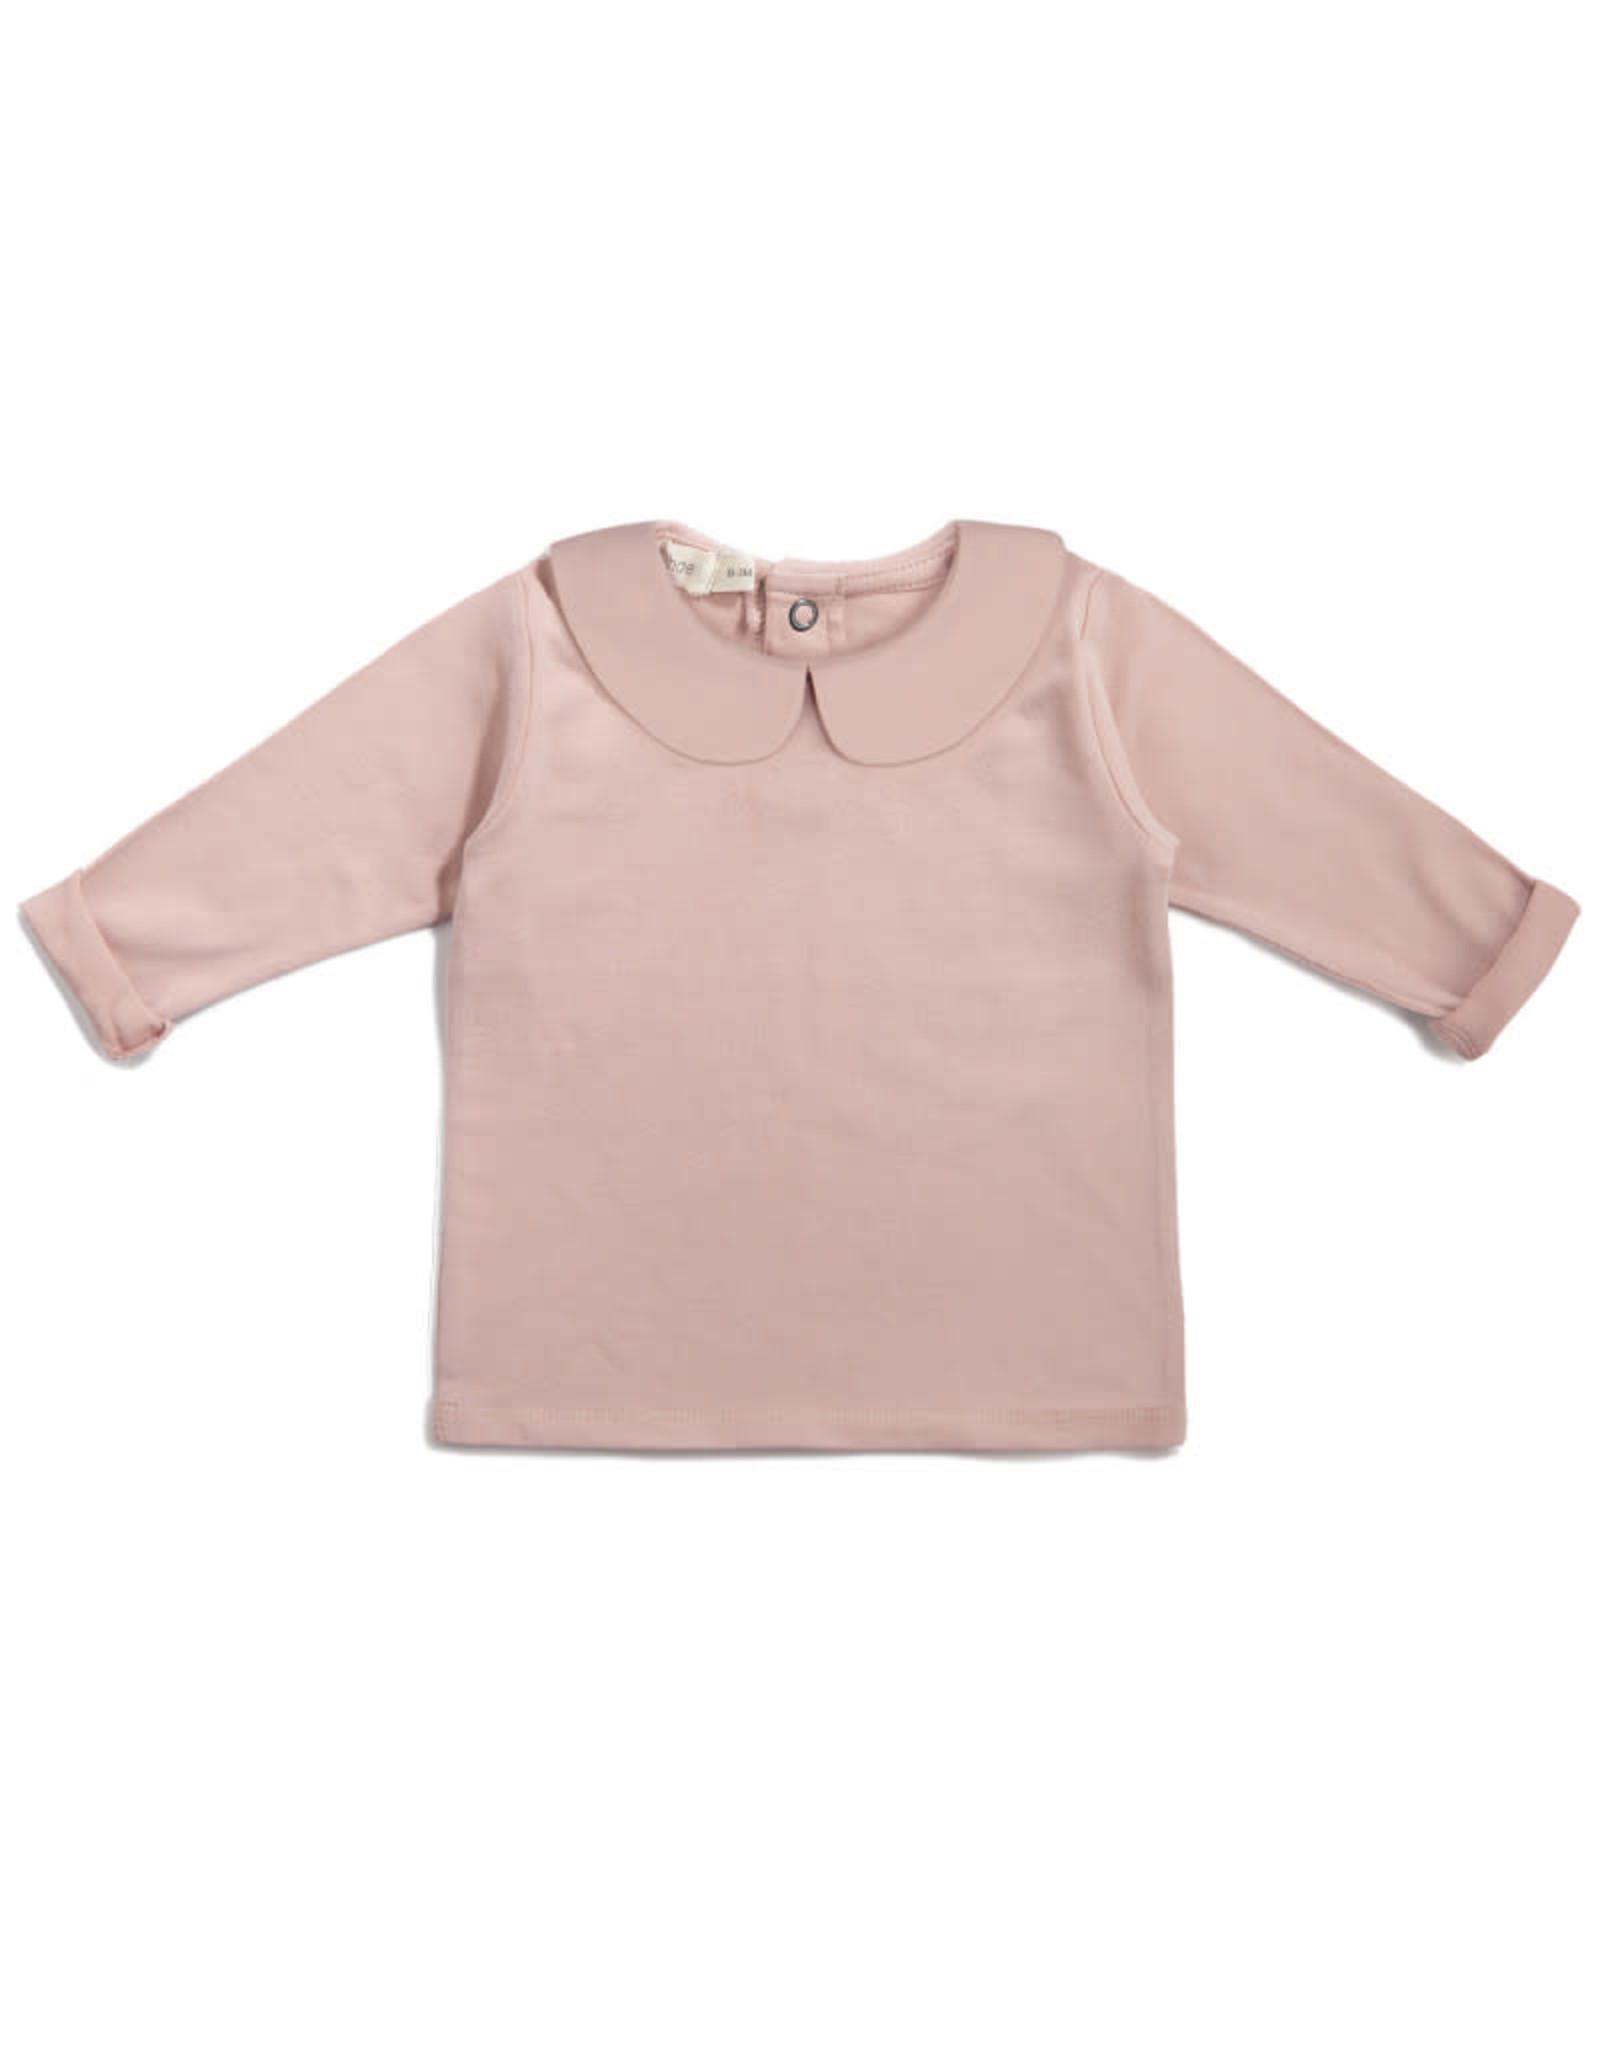 Phil & Phae Baby collar tee Vintage blush